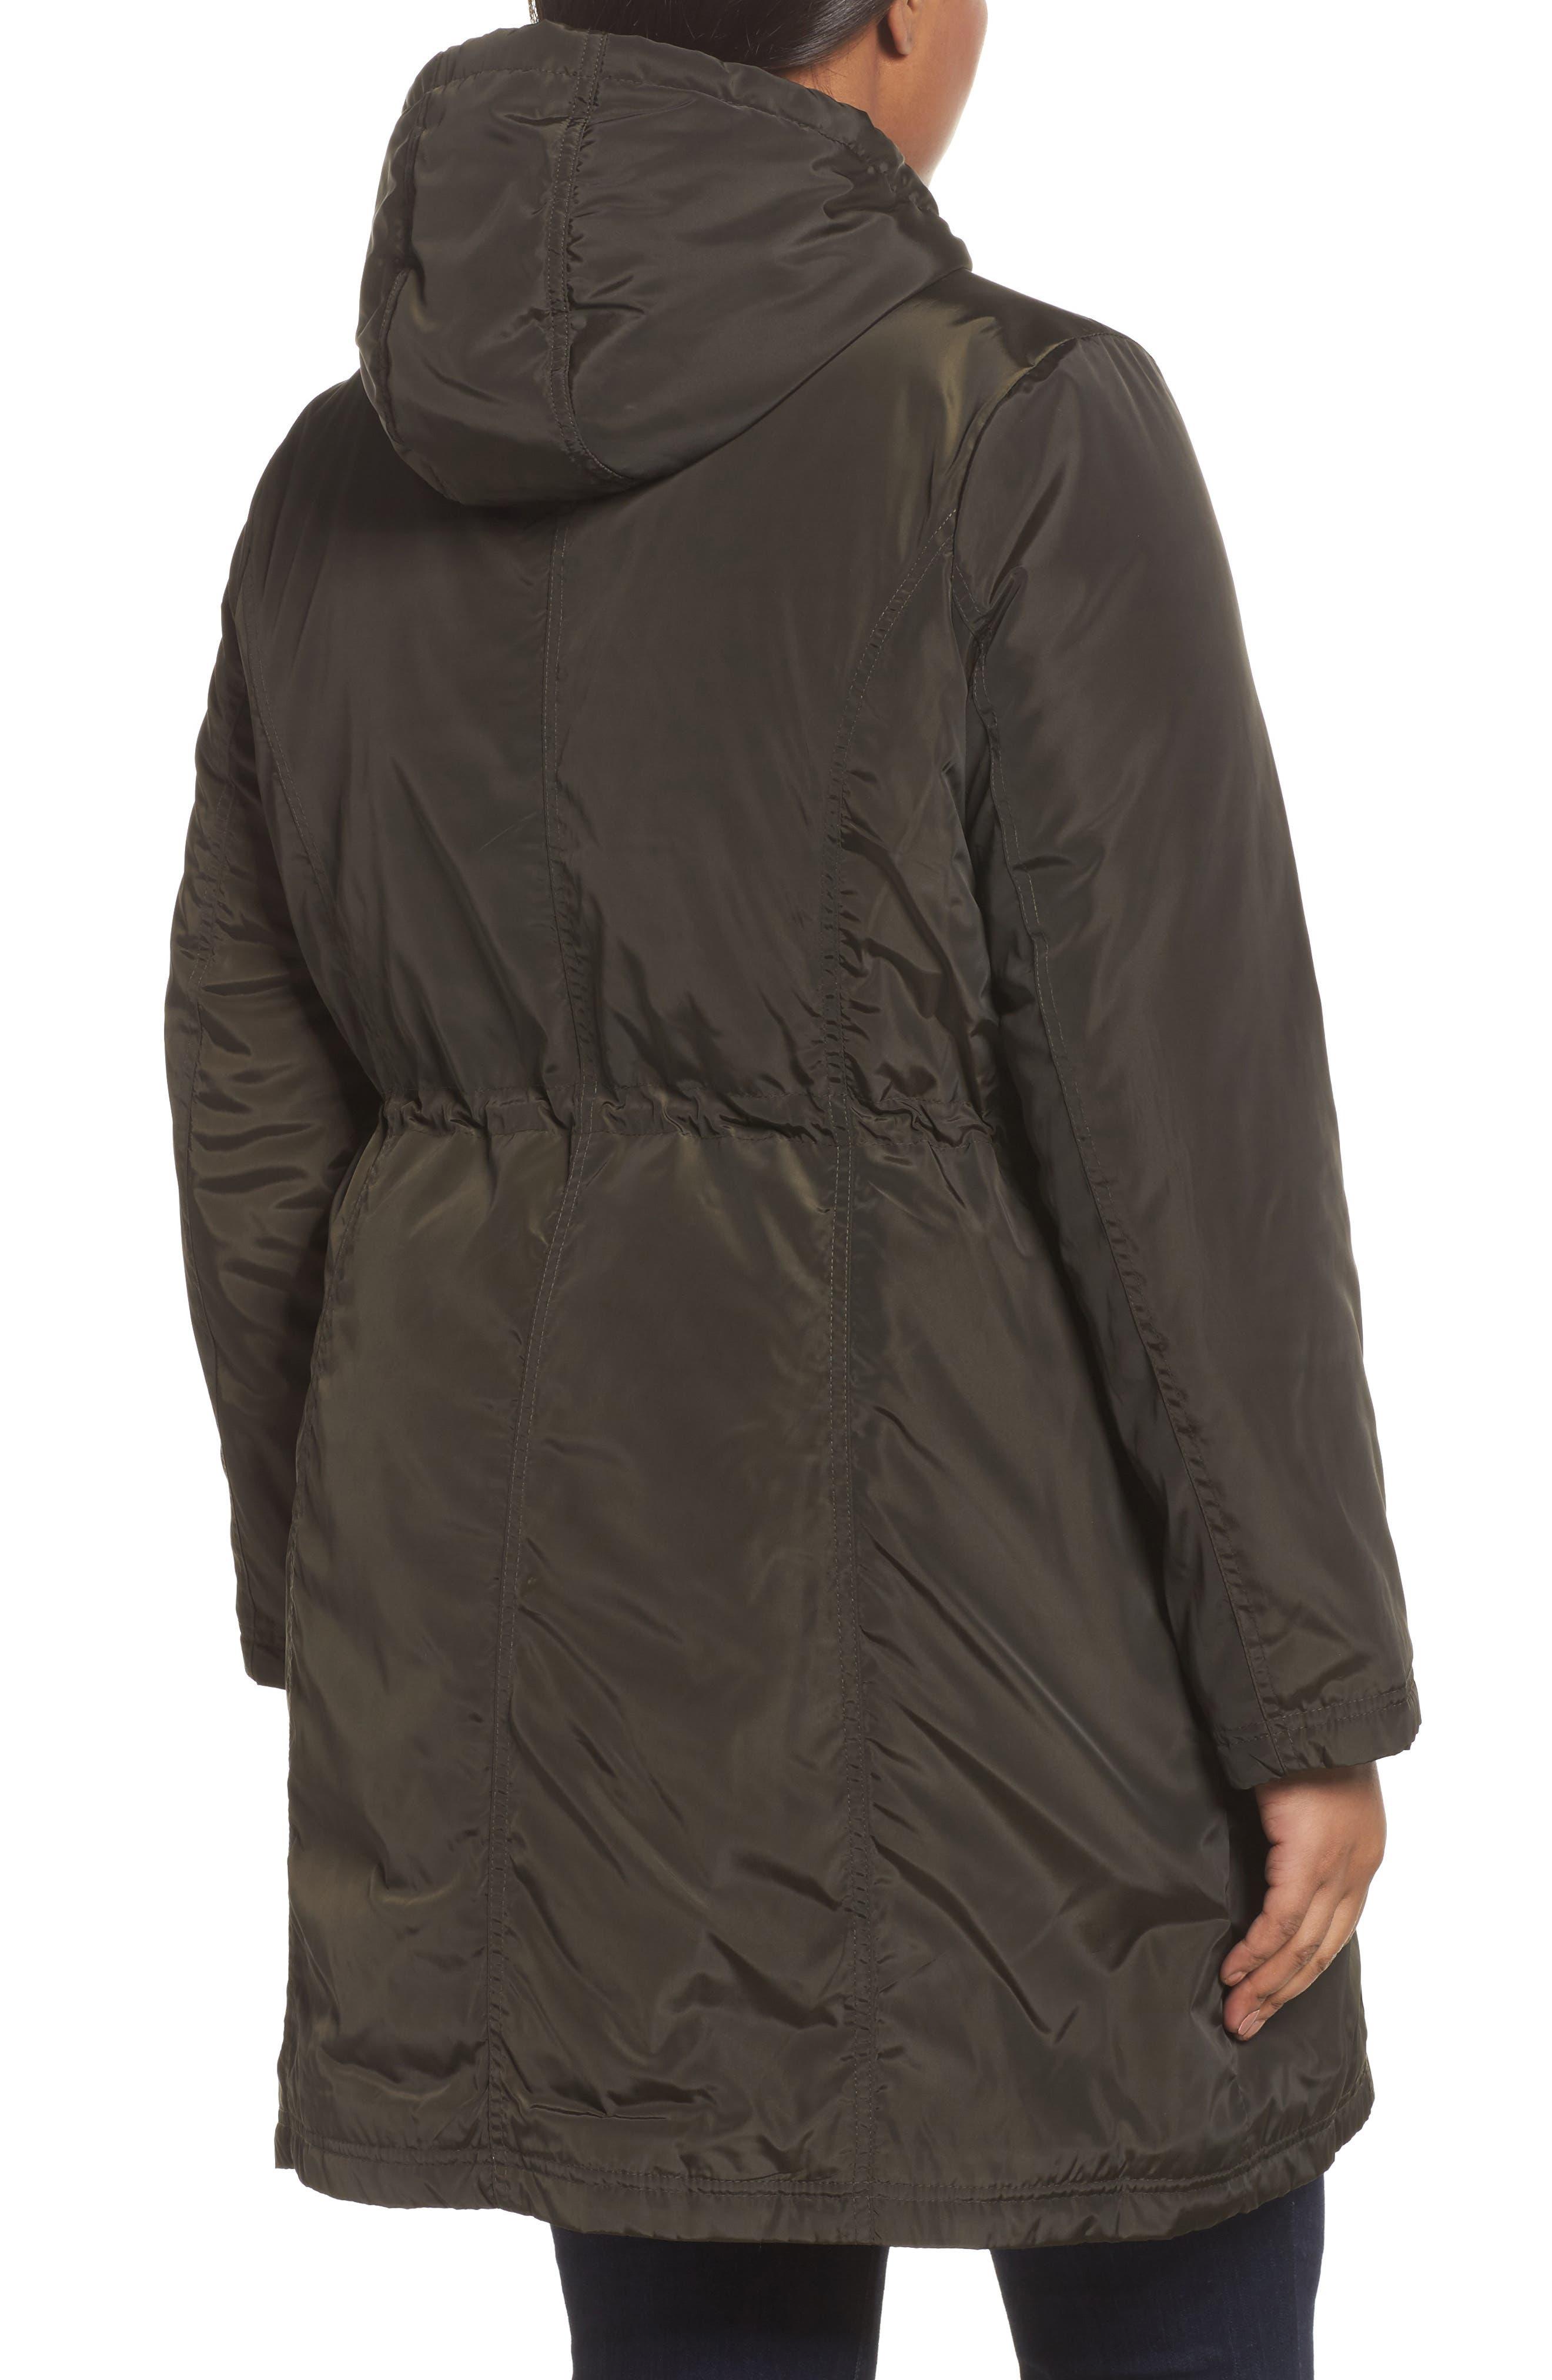 Tiffany Raincoat,                             Alternate thumbnail 2, color,                             Olive